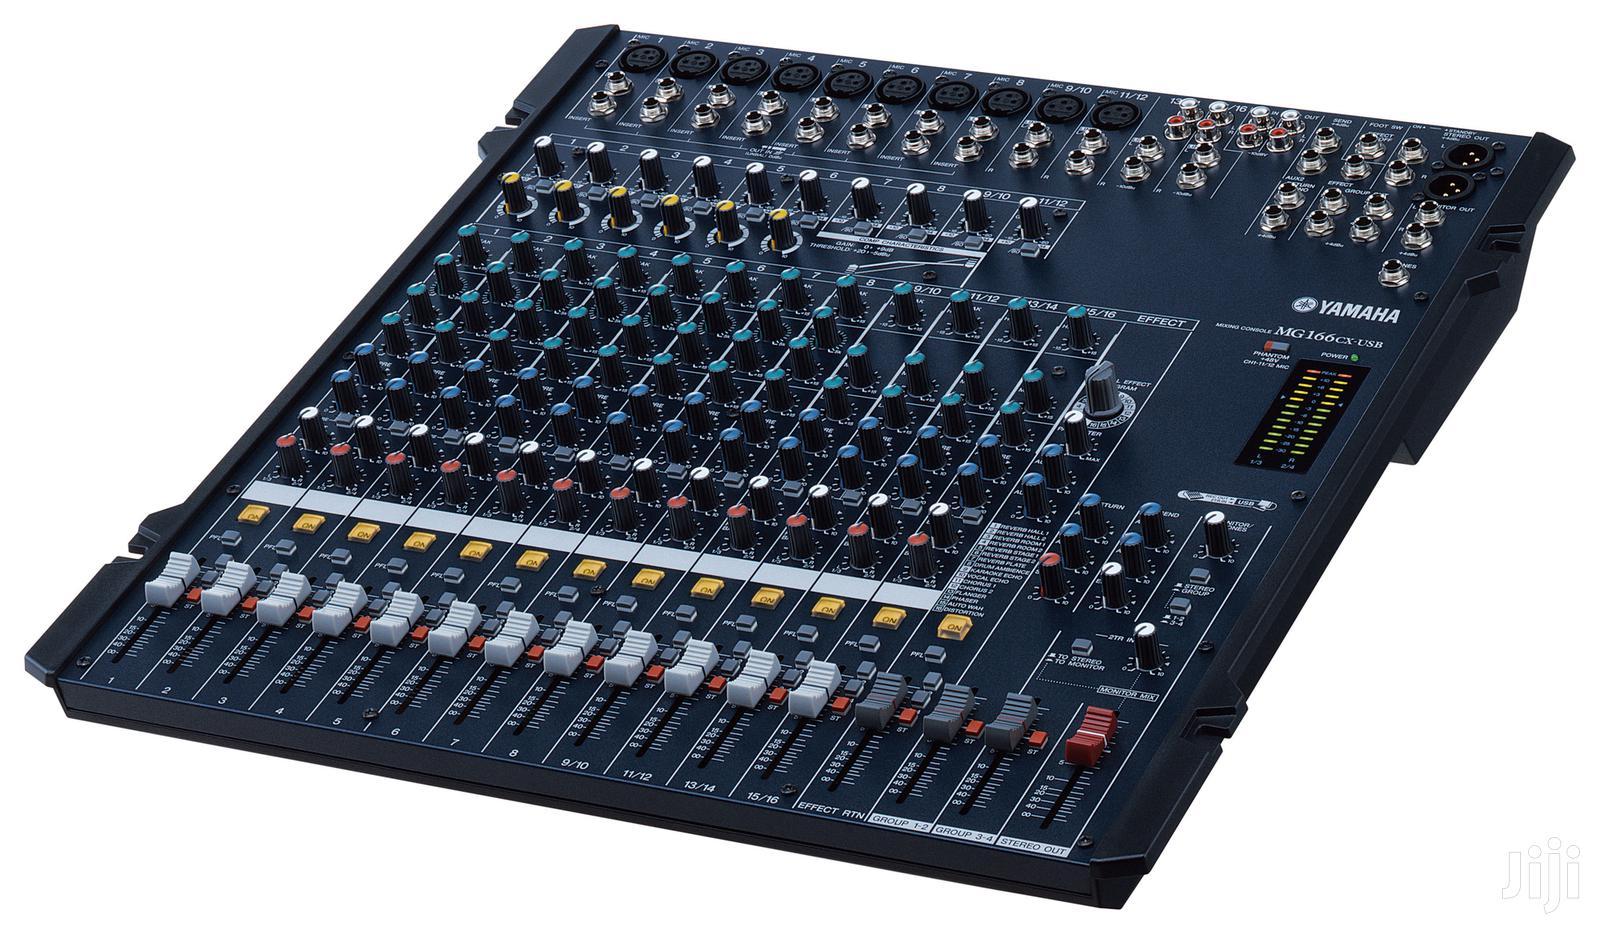 Yamaha Mixer Mg166cx Usb | Audio & Music Equipment for sale in Accra Metropolitan, Greater Accra, Ghana